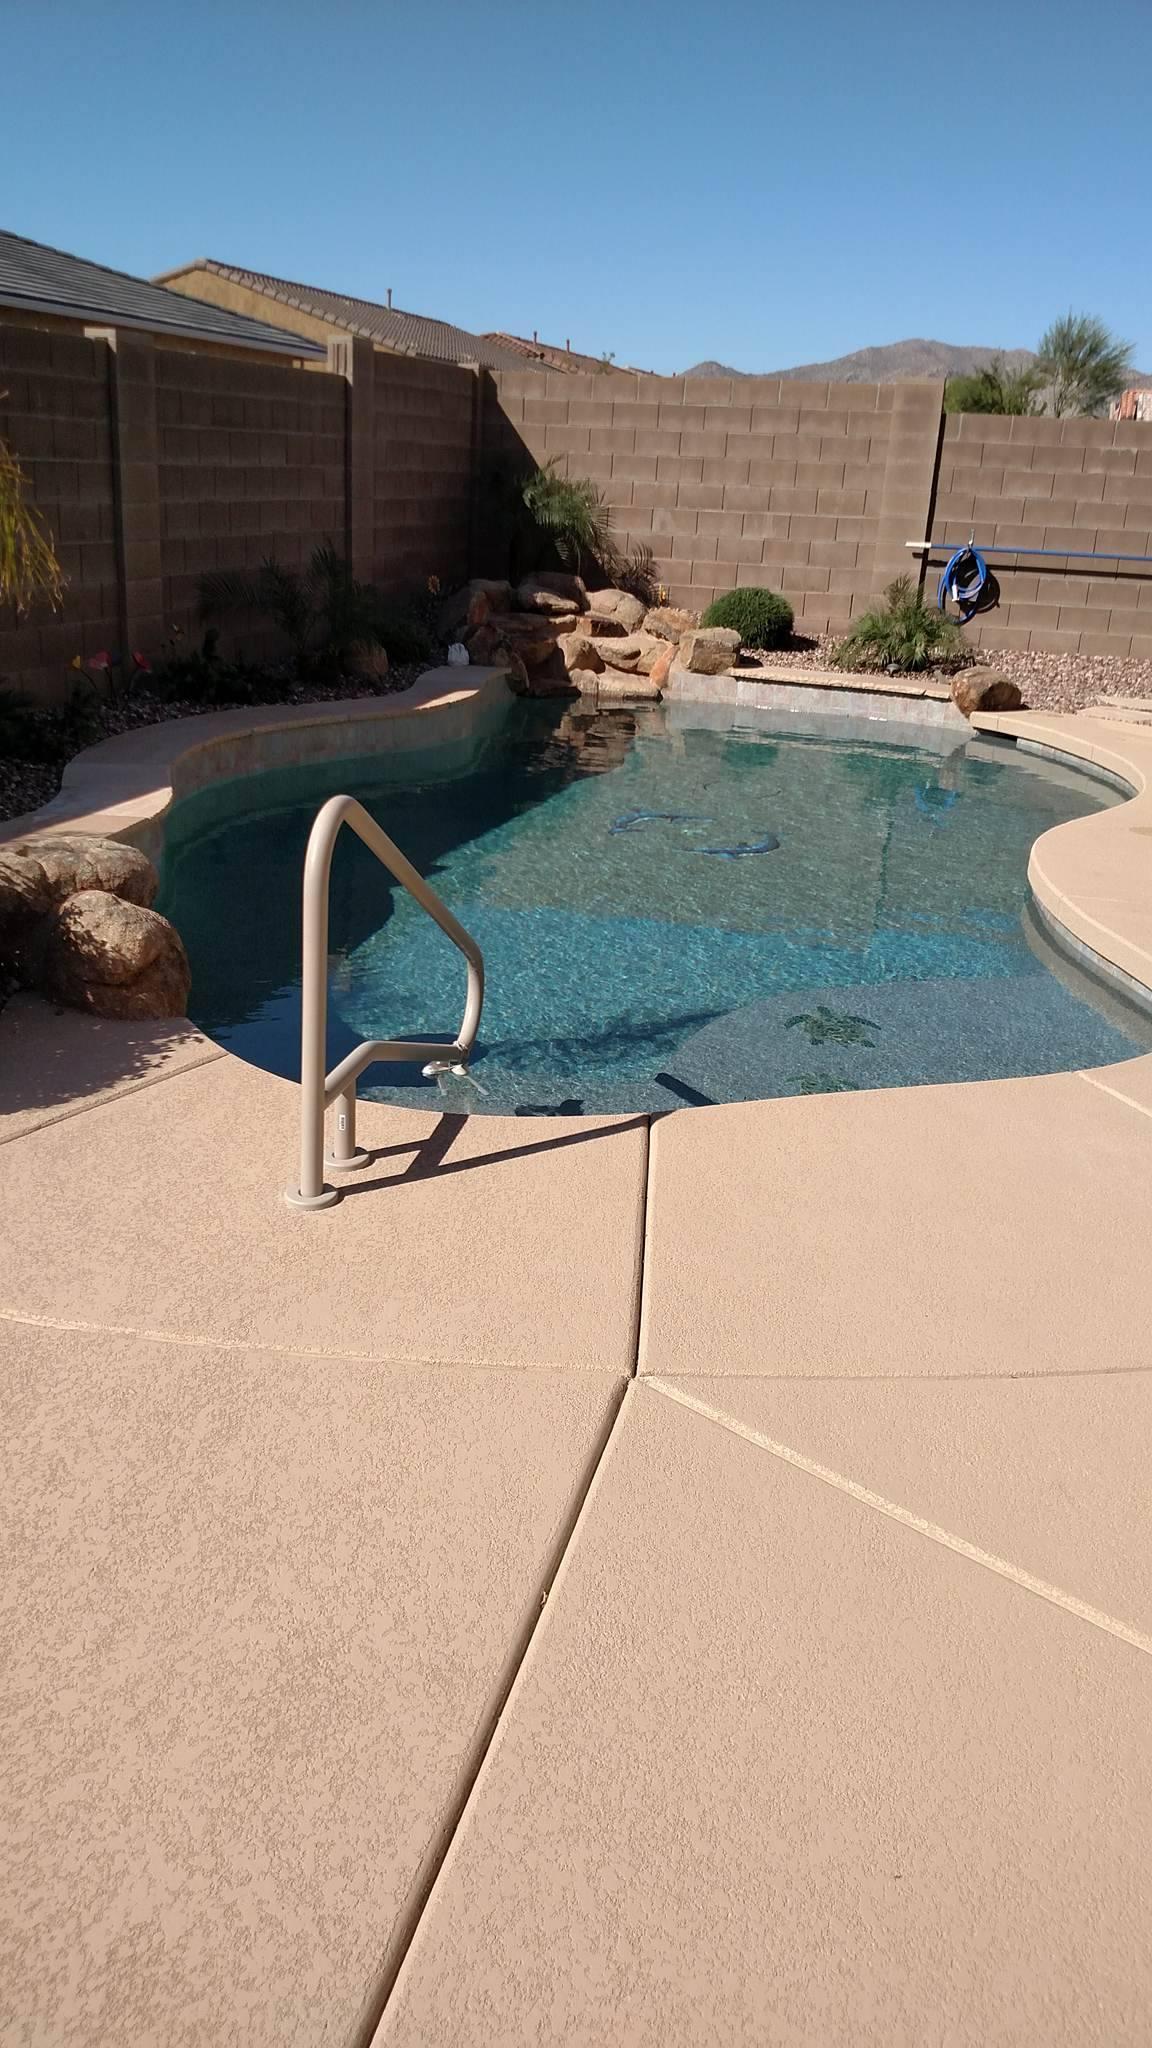 Surprise-swimming-pool-Oddo-family-Presidential-Pools